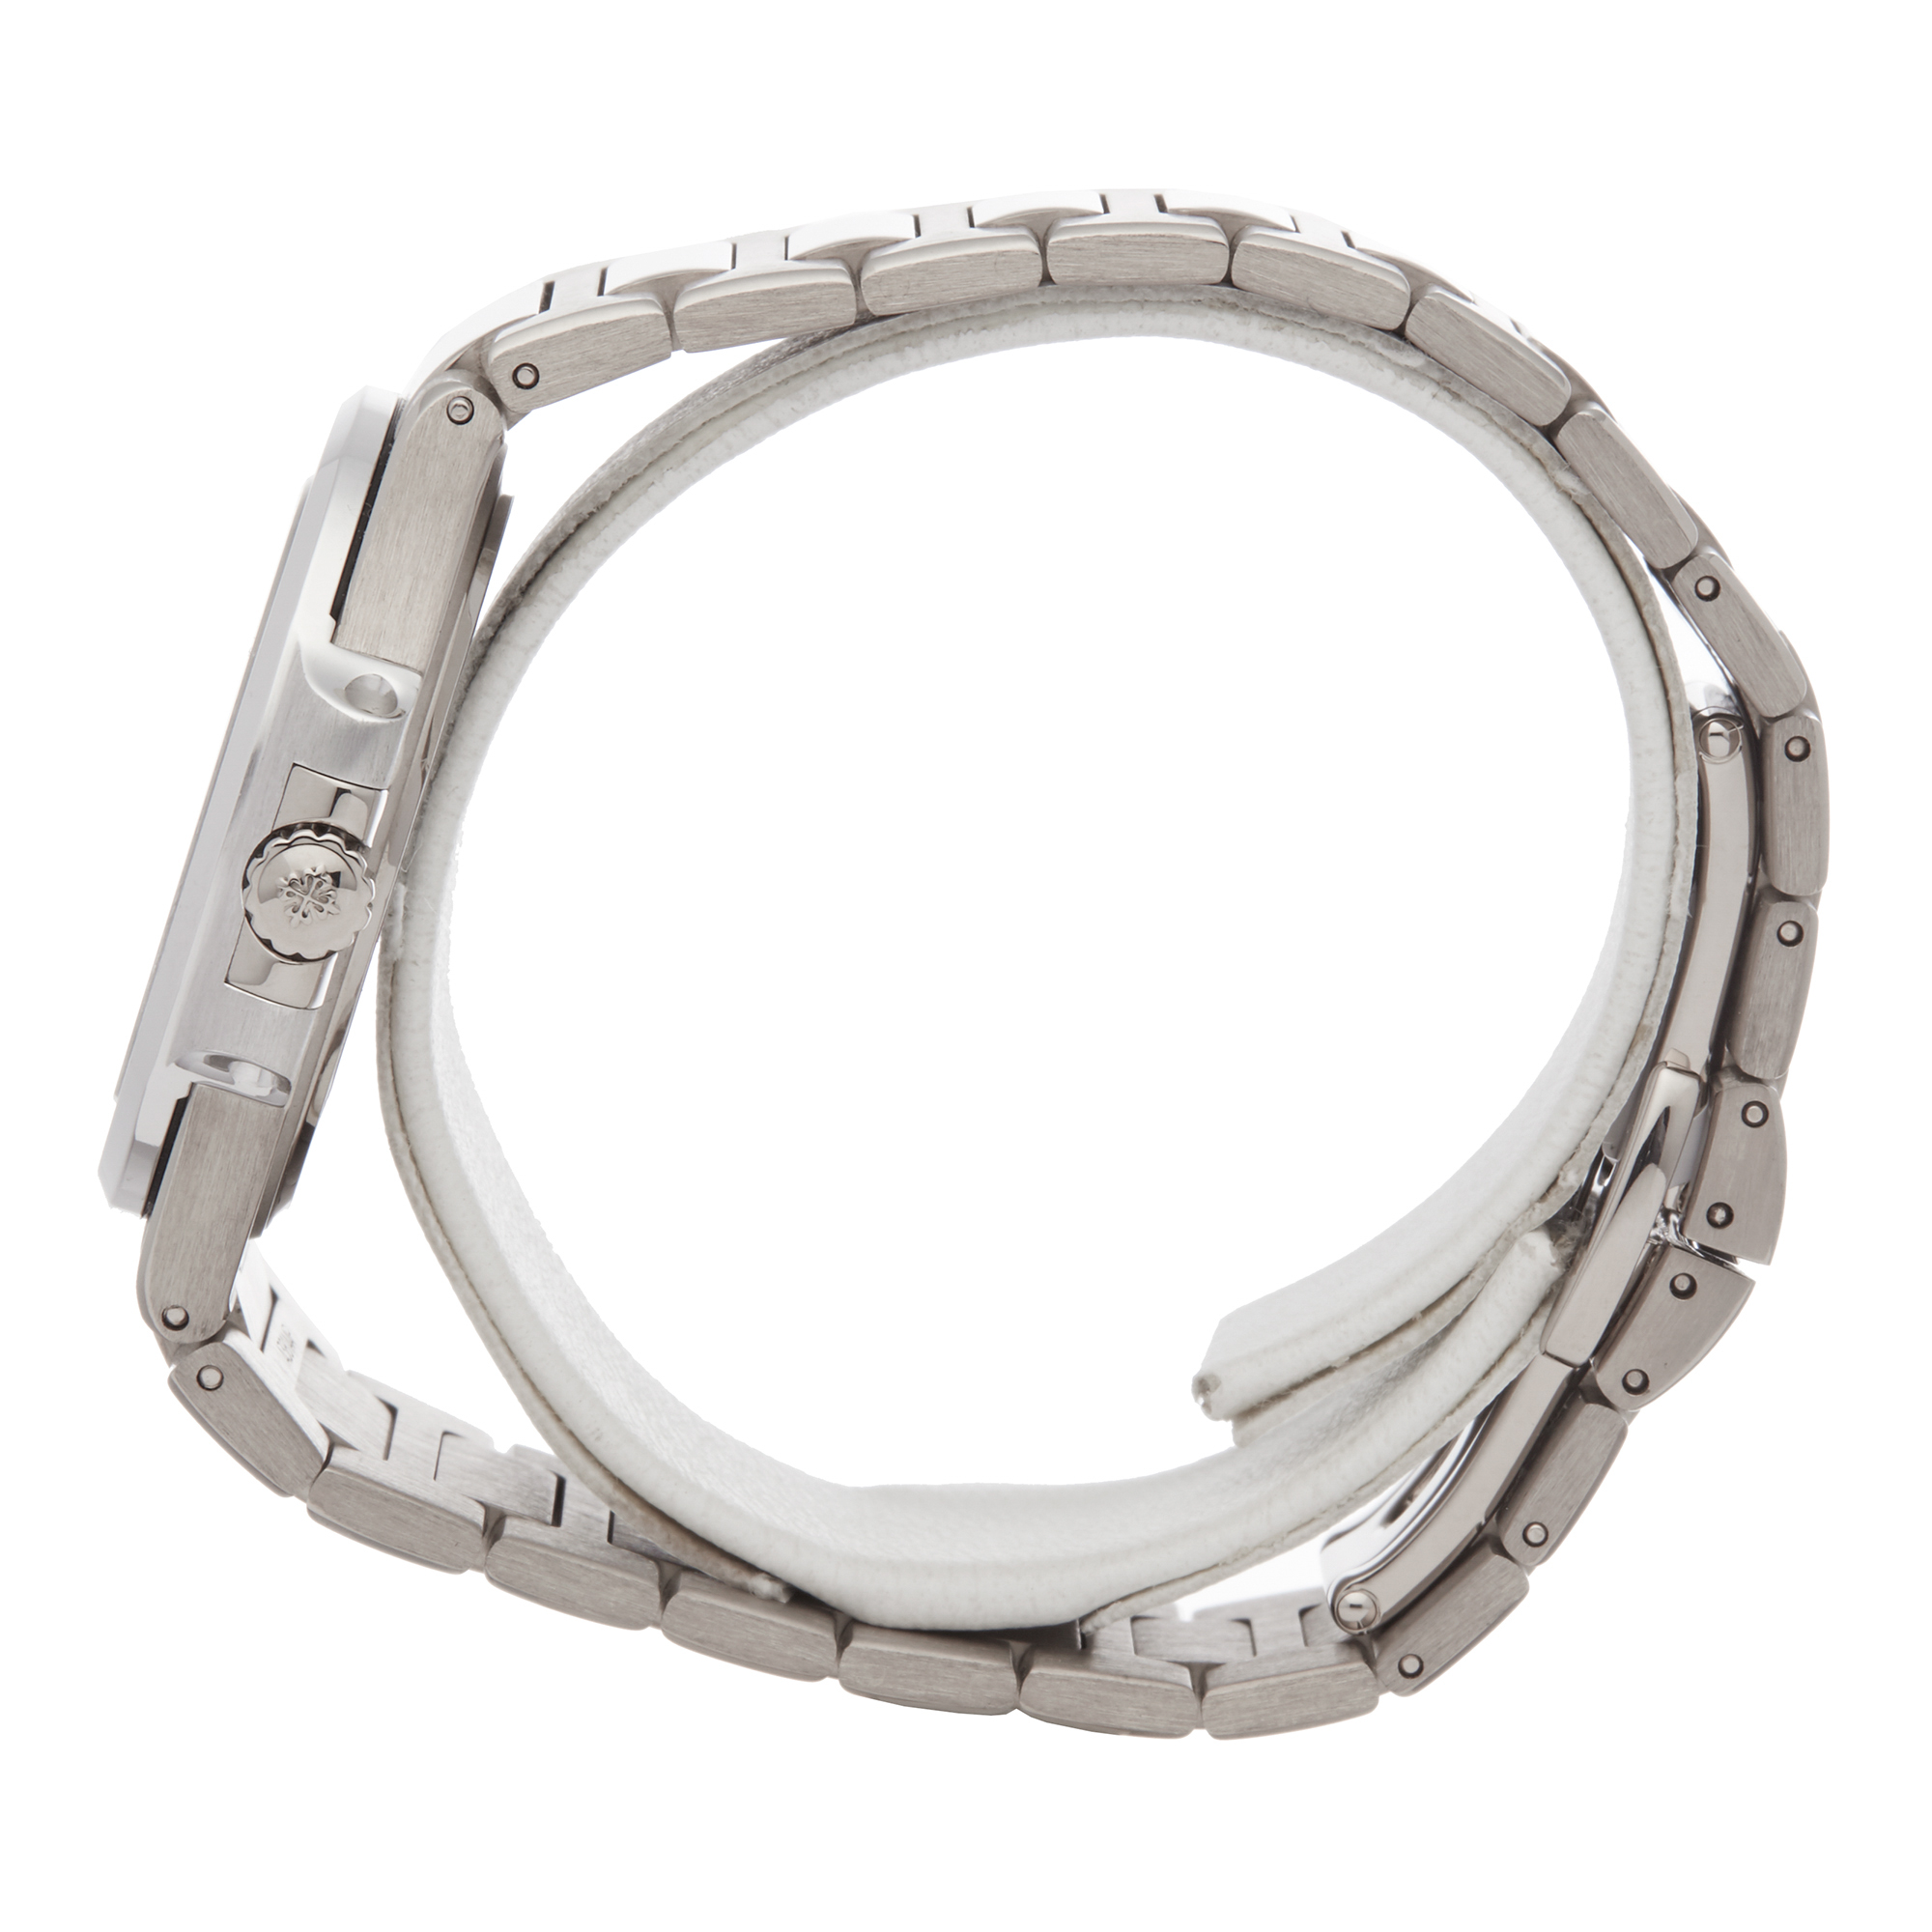 Patek Philippe Nautilus 7010G Ladies White Gold Diamond Watch - Image 7 of 8